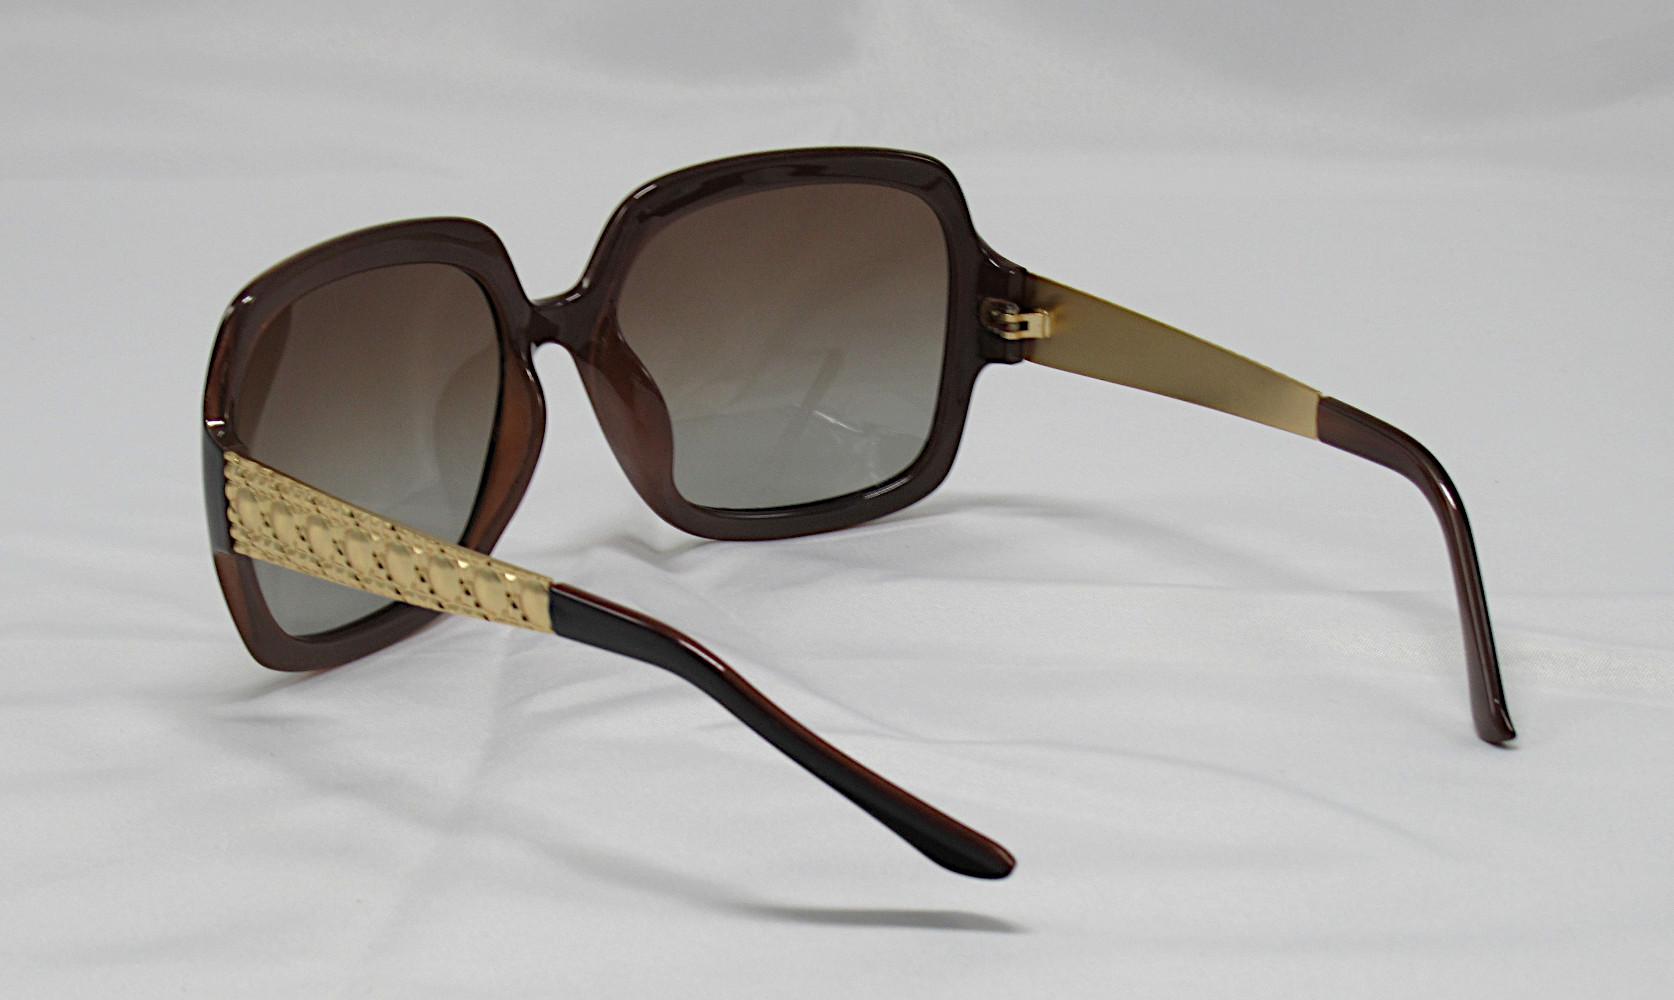 RJ-114_Polarized Sunglasses_brown-gold-P2232-4